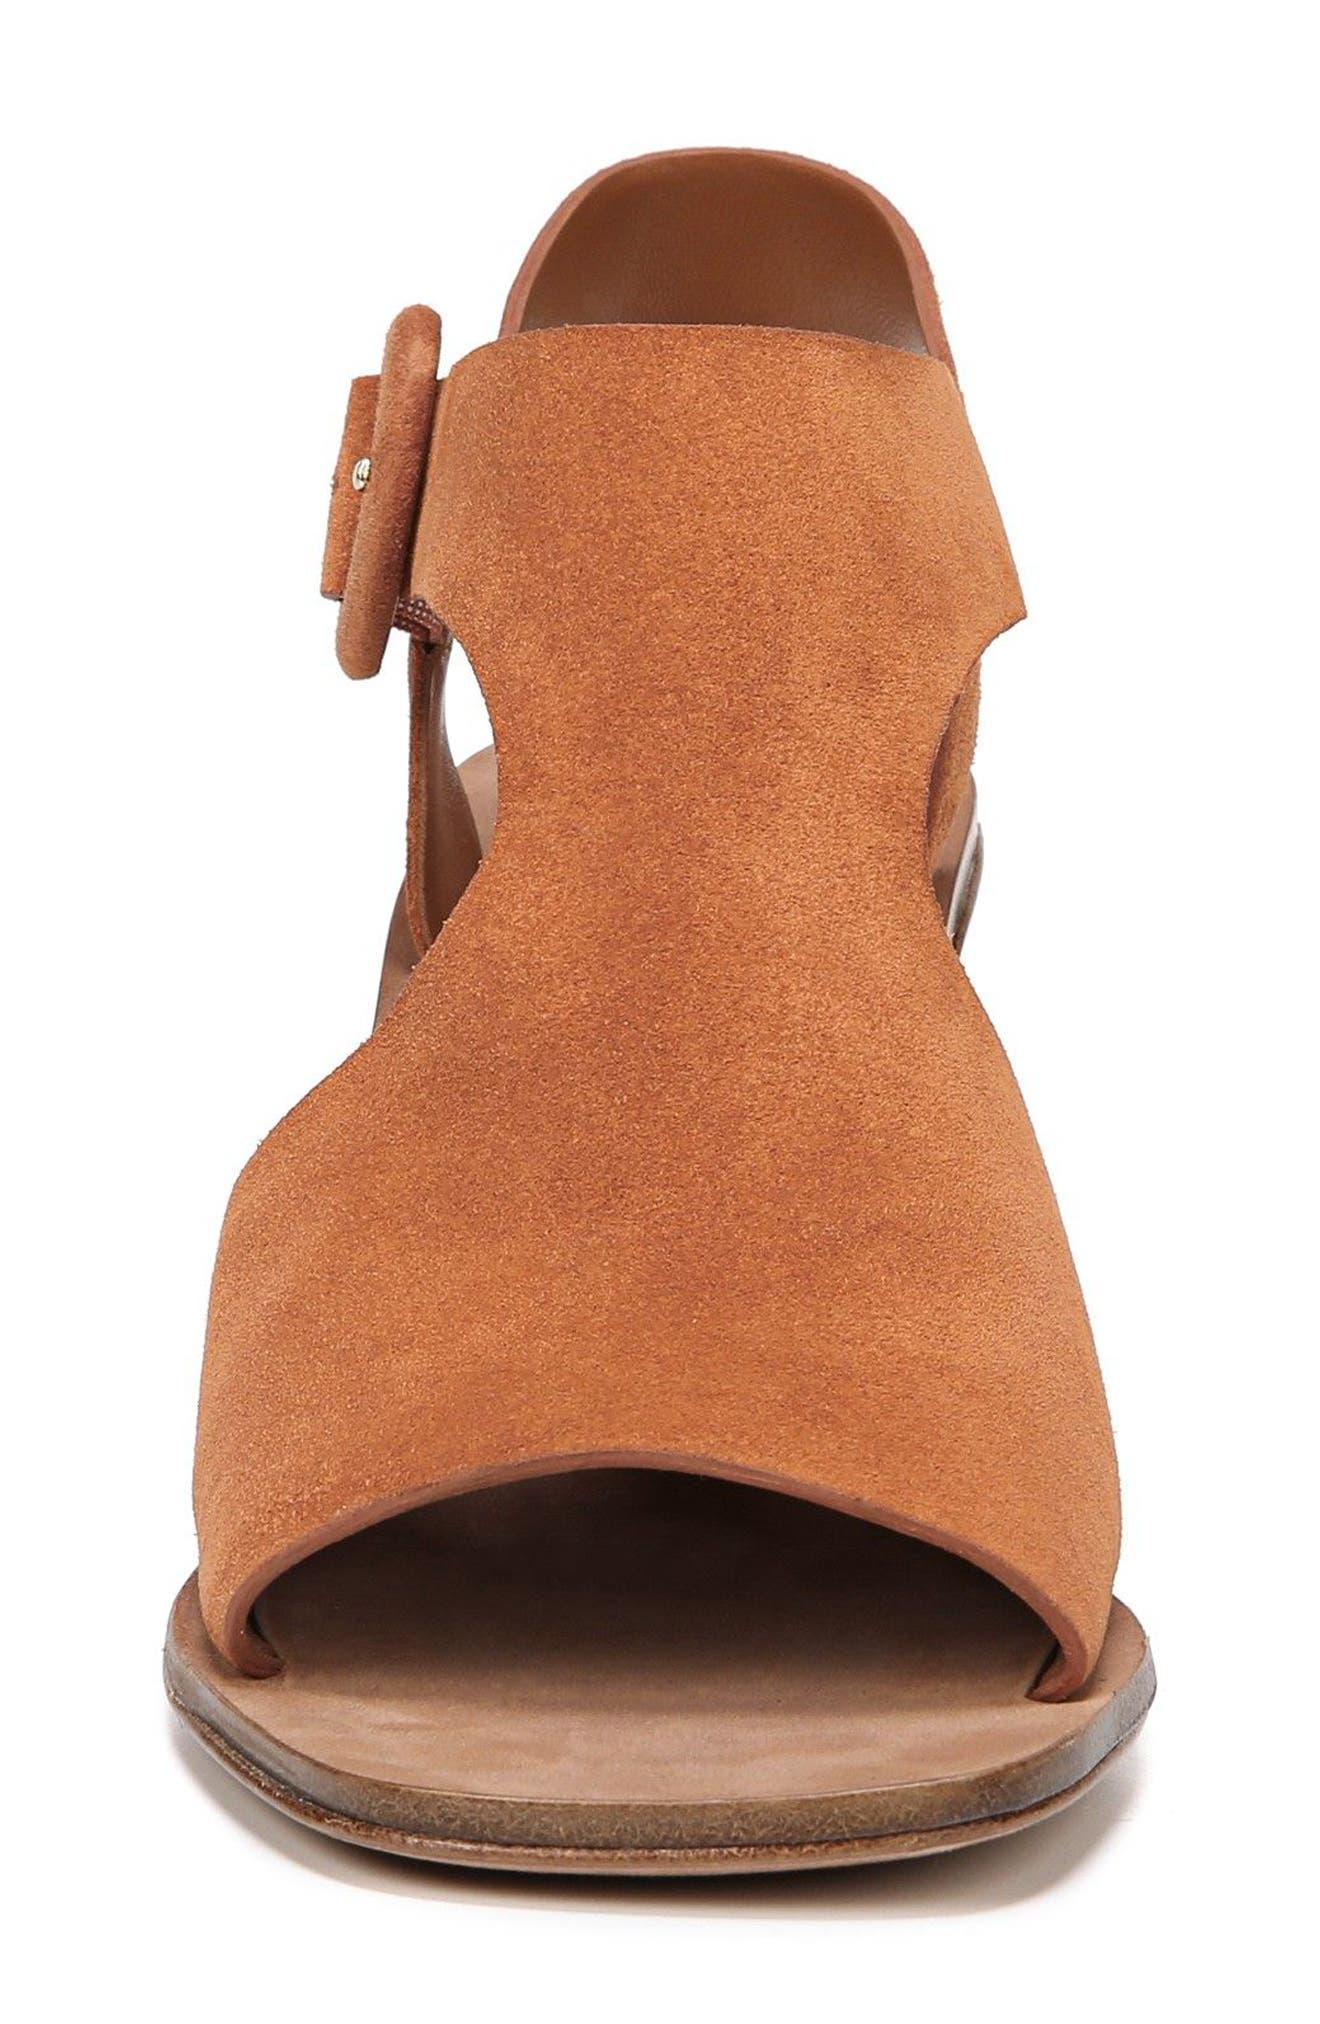 Katya Shield Sandal,                             Alternate thumbnail 4, color,                             Amber Suede